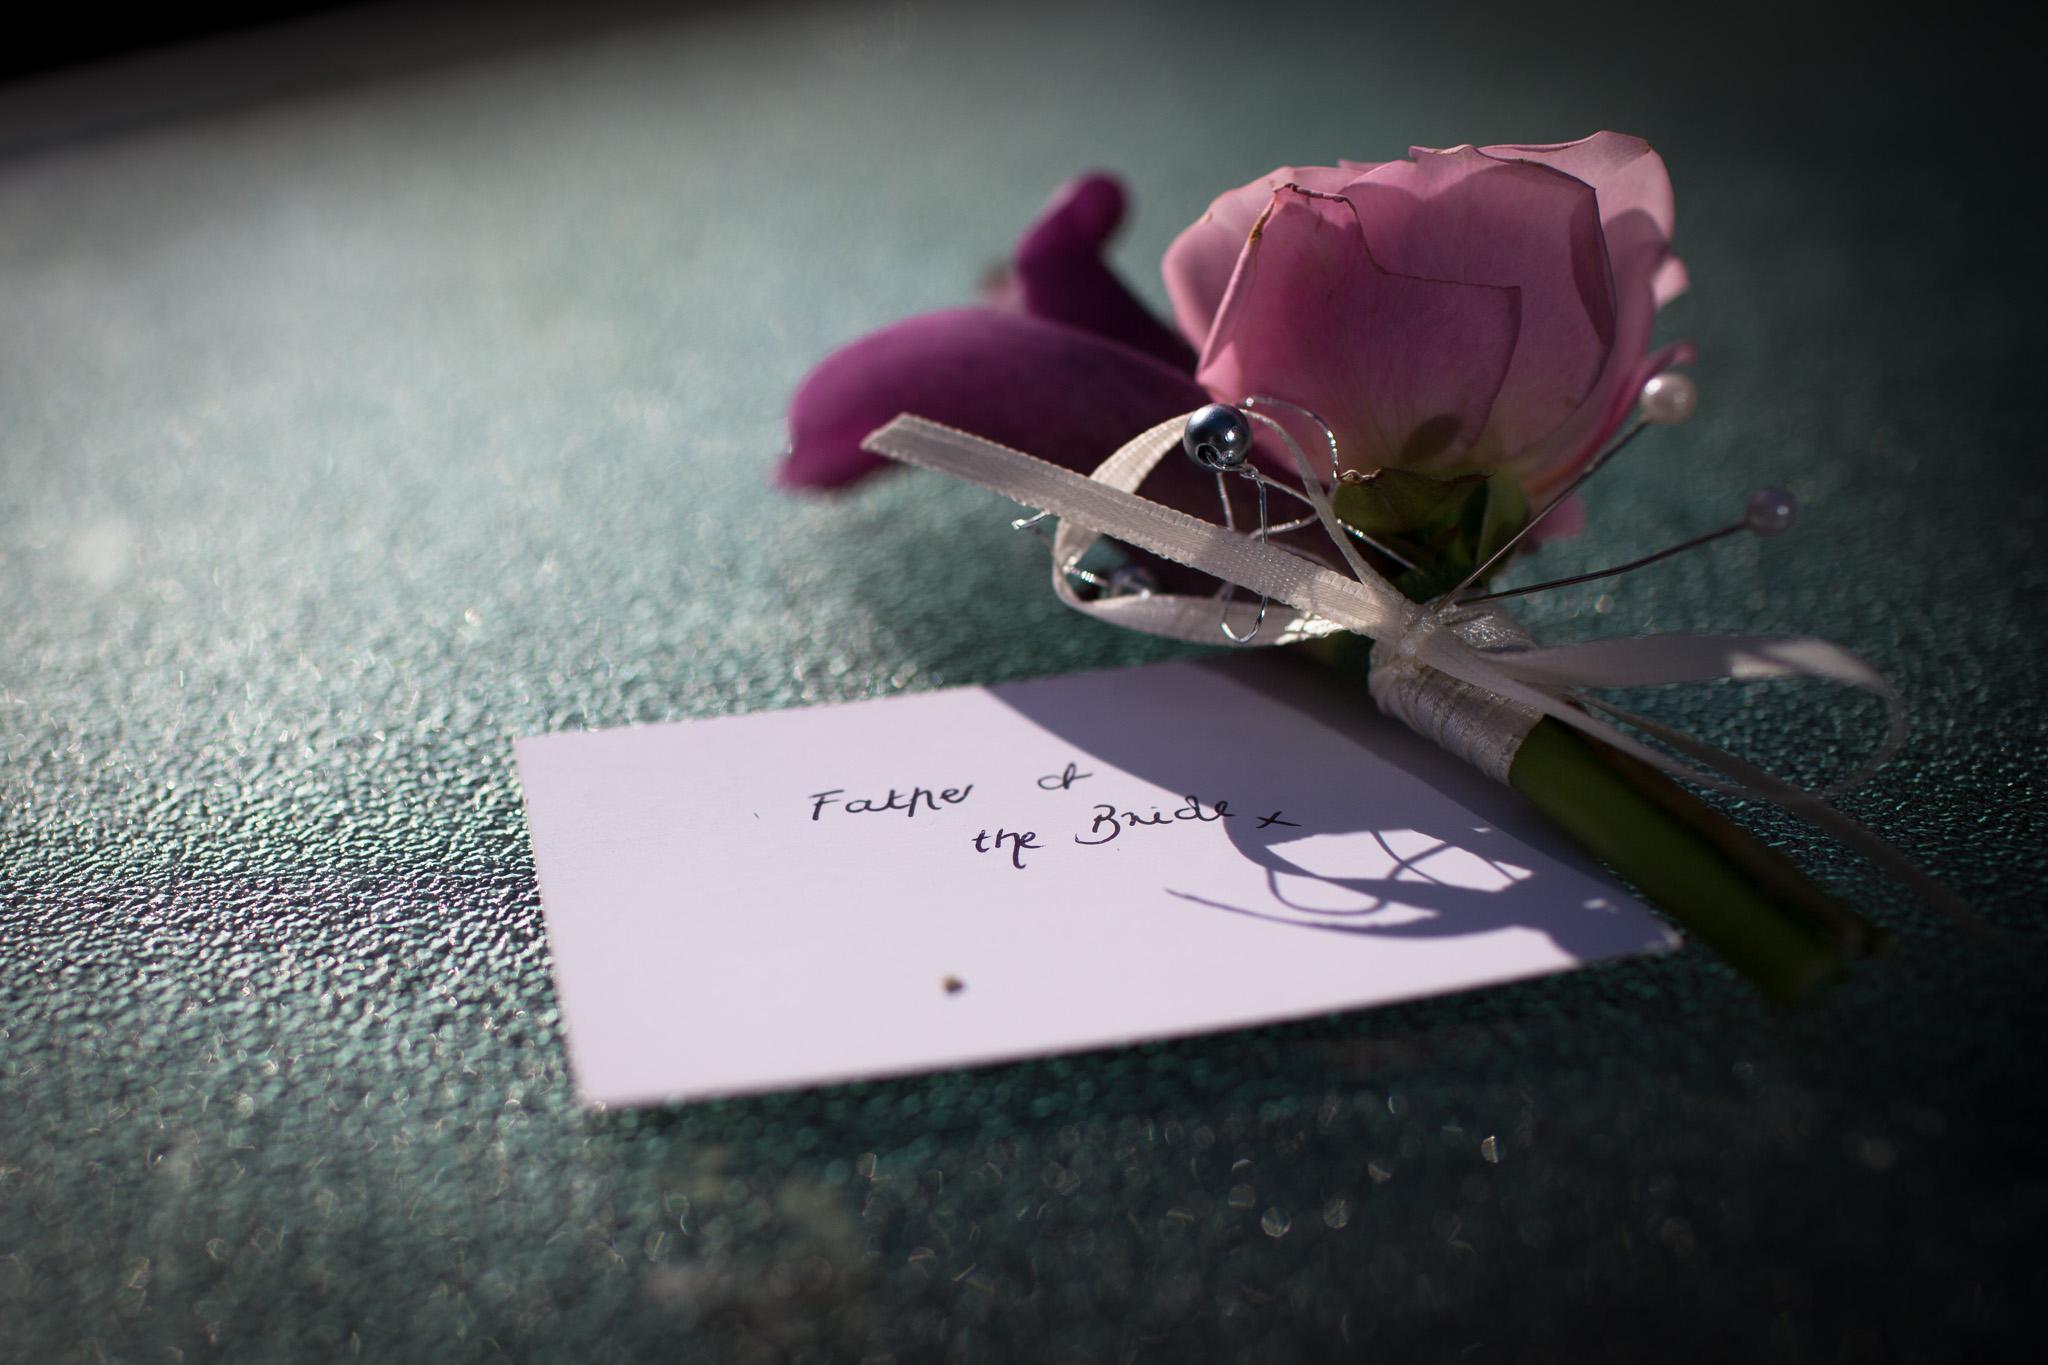 Mark_Barnes_Northern_Ireland_Wedding_Photography_Marine_hotel_ballycastle_Wedding_Photography_Janet&Darren-6.jpg